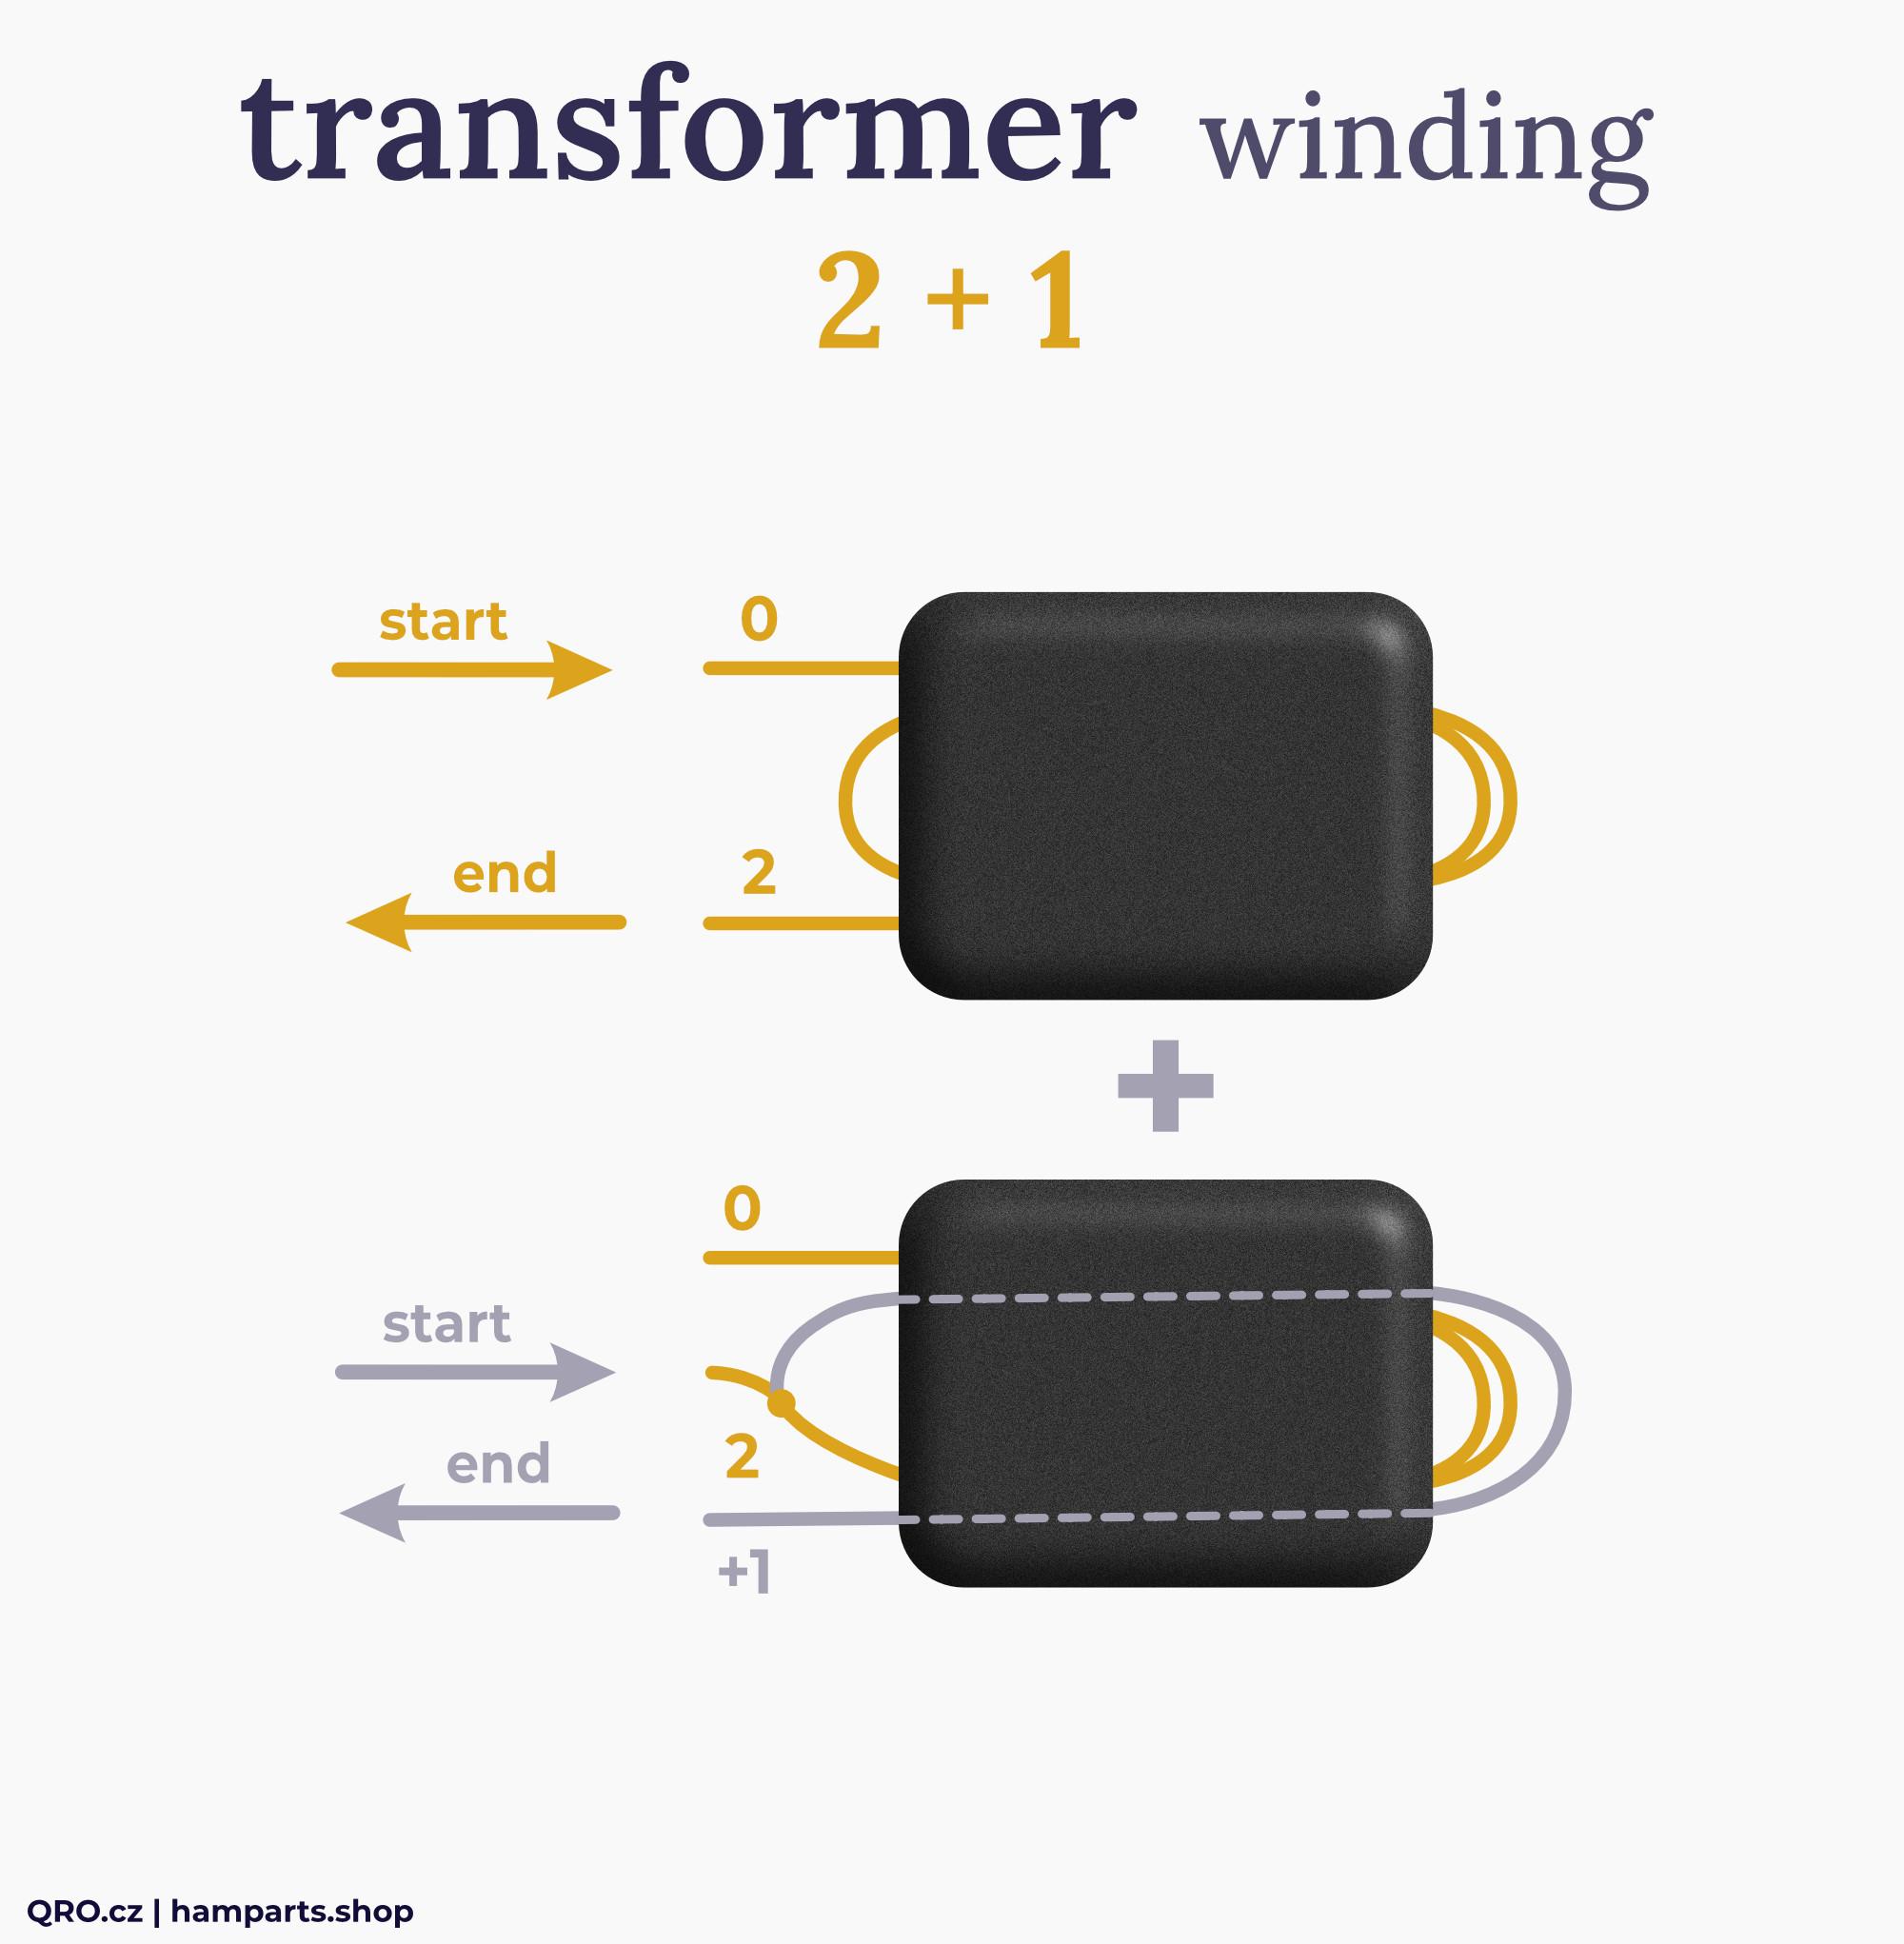 transformer core winding by qro.cz hamparts.shop